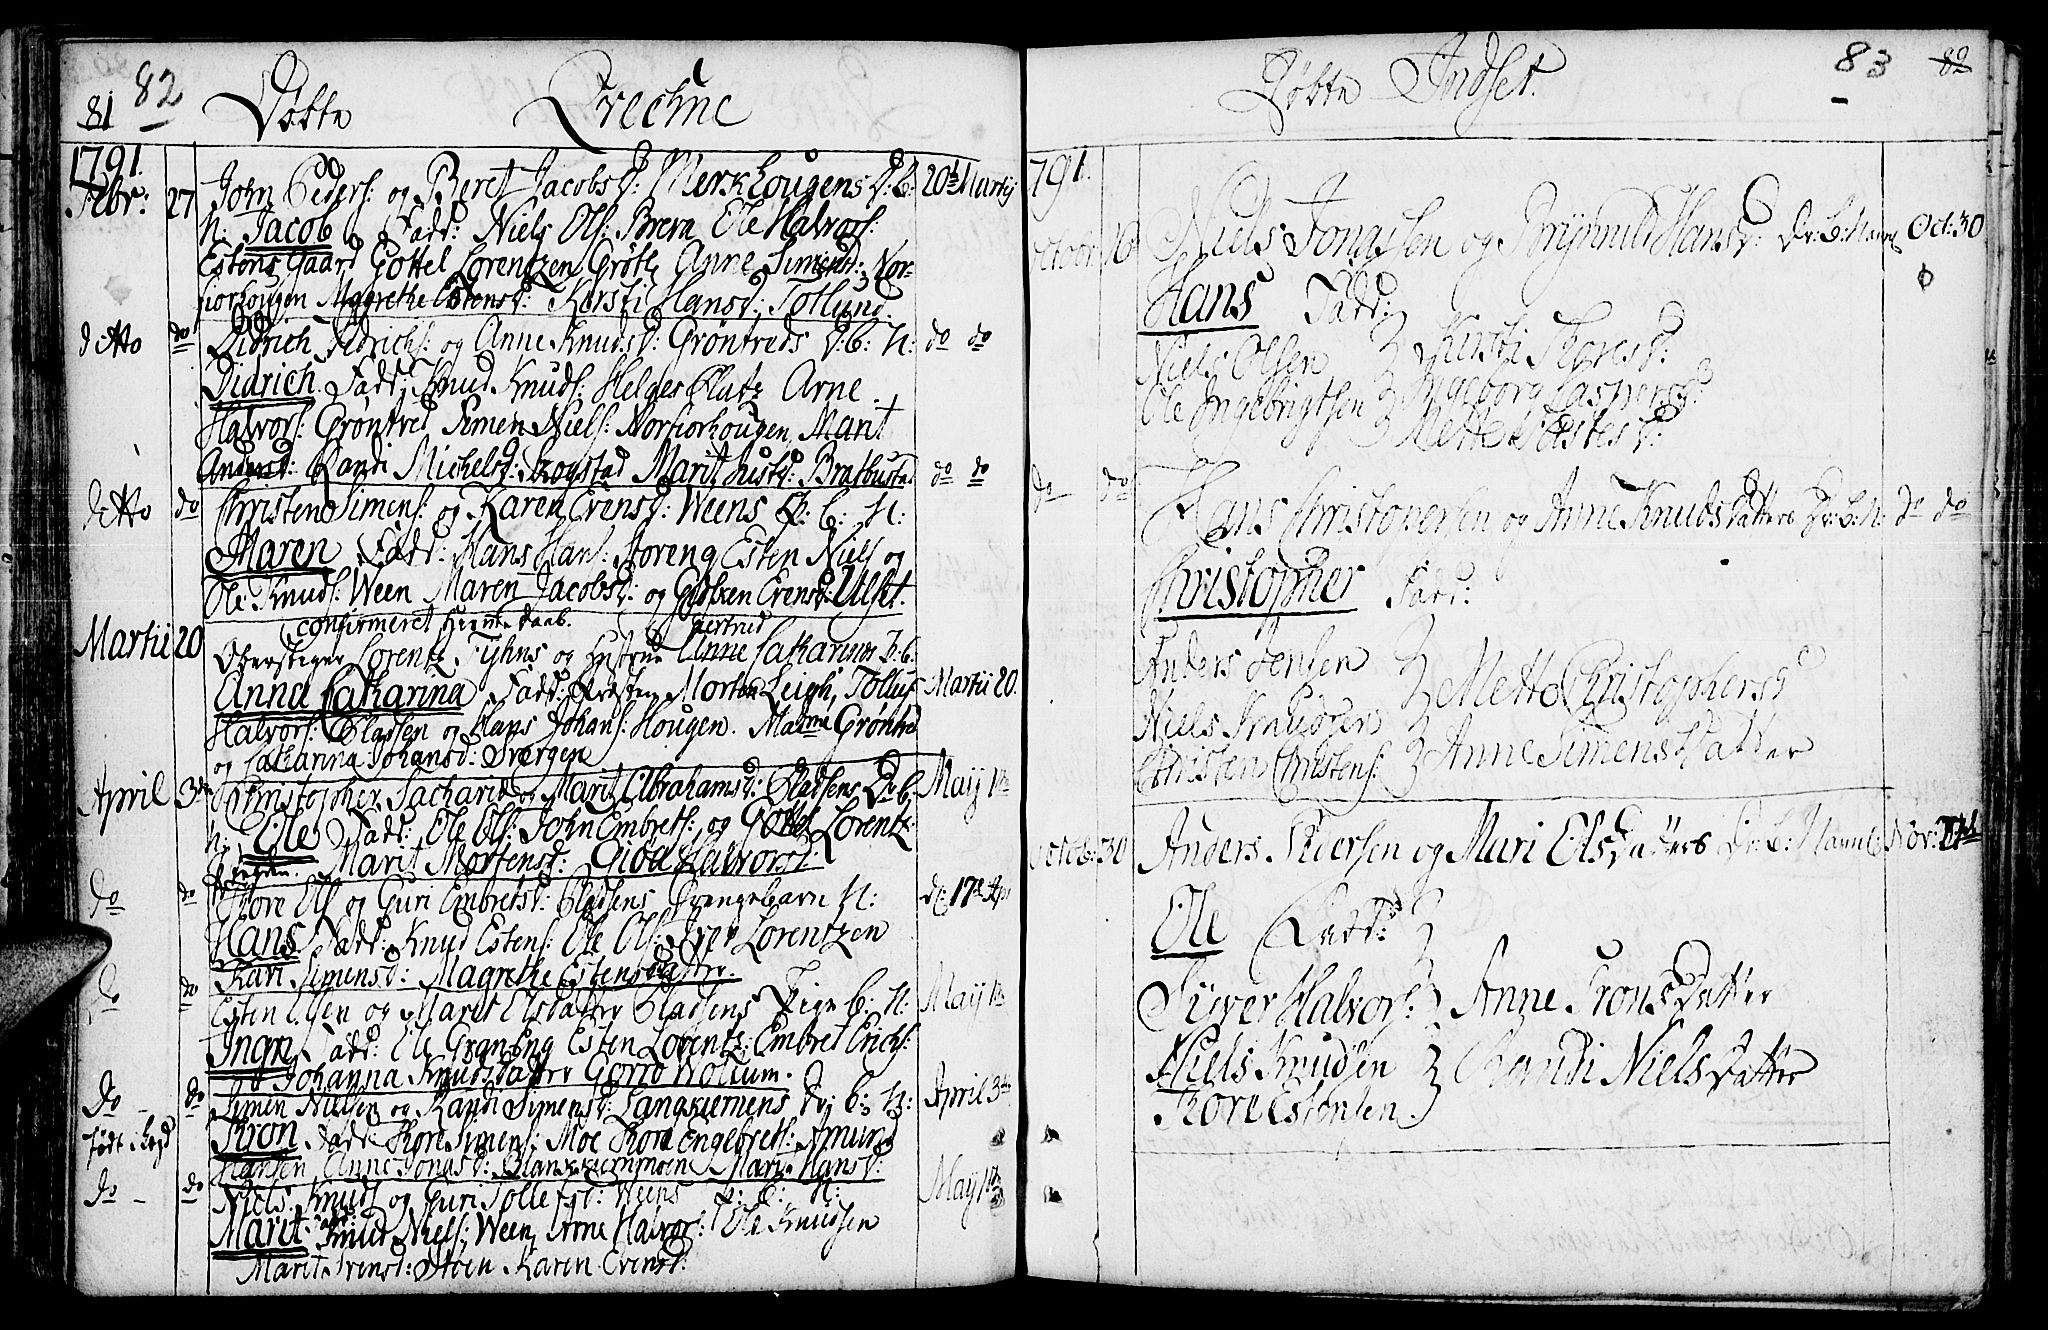 SAH, Kvikne prestekontor, Ministerialbok nr. 3, 1785-1814, s. 82-83